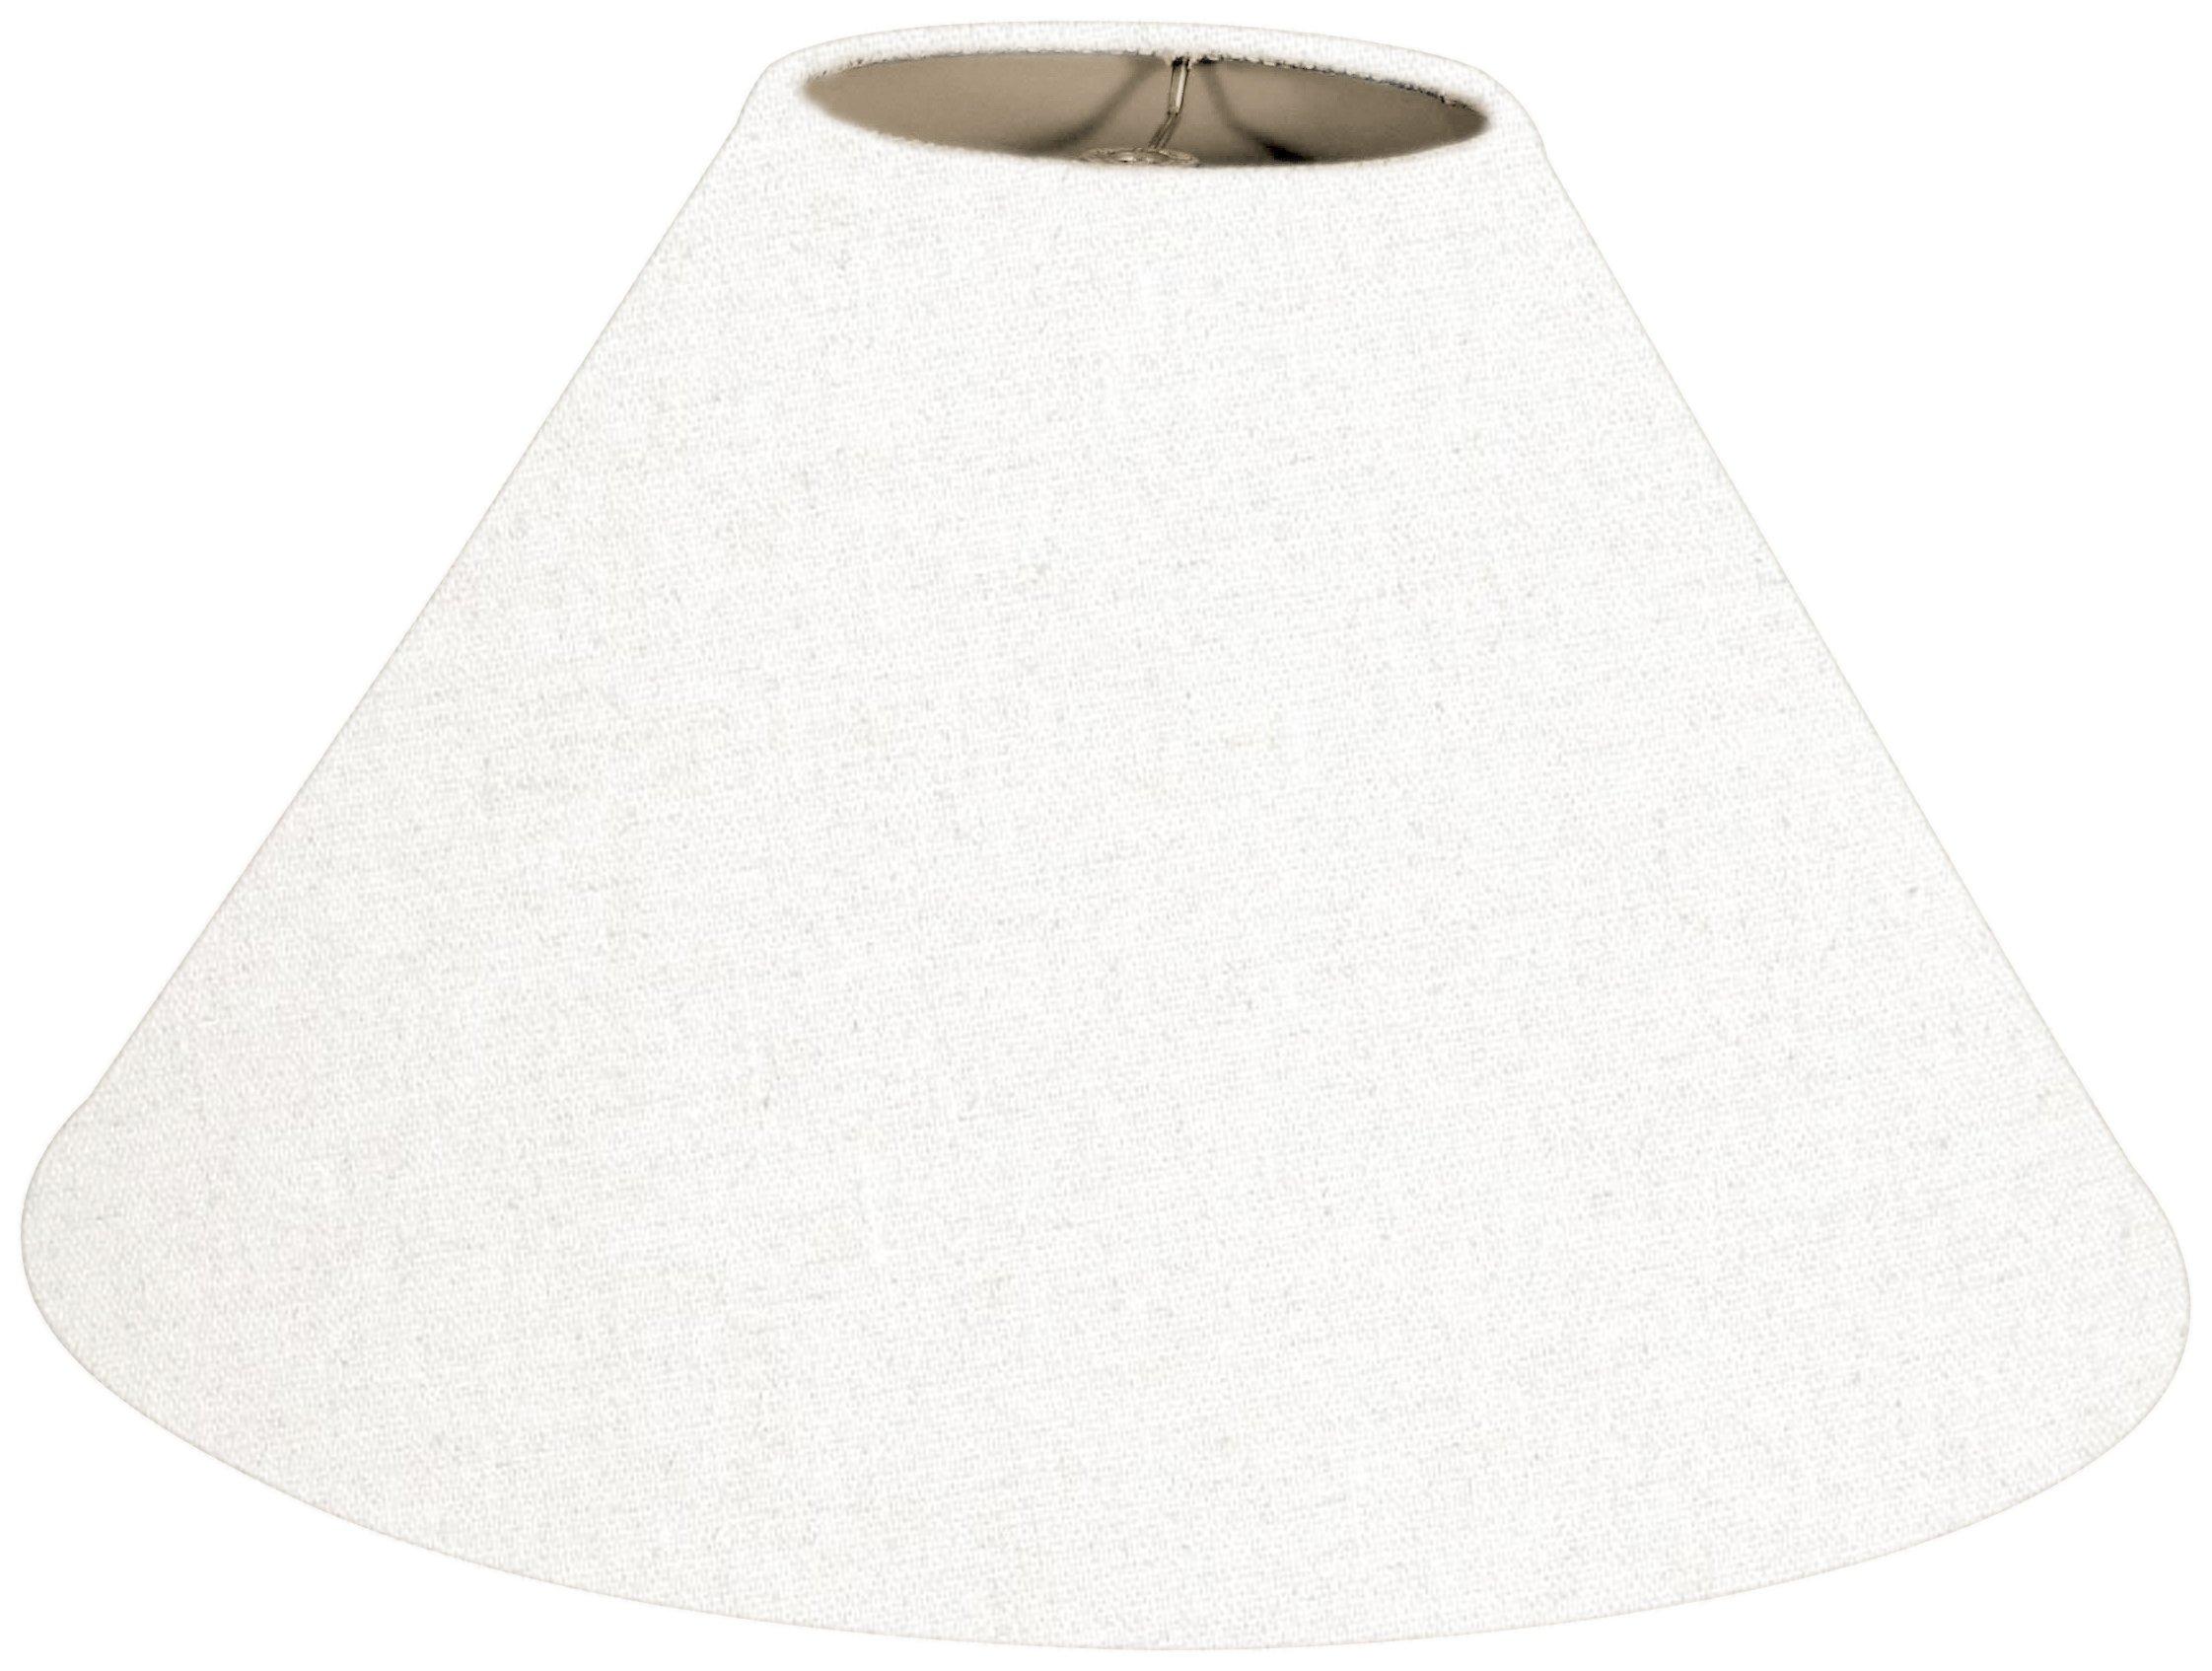 Royal Designs Coolie Empire Hardback Lamp Shade, Linen White, 6 x 18 x 11.5